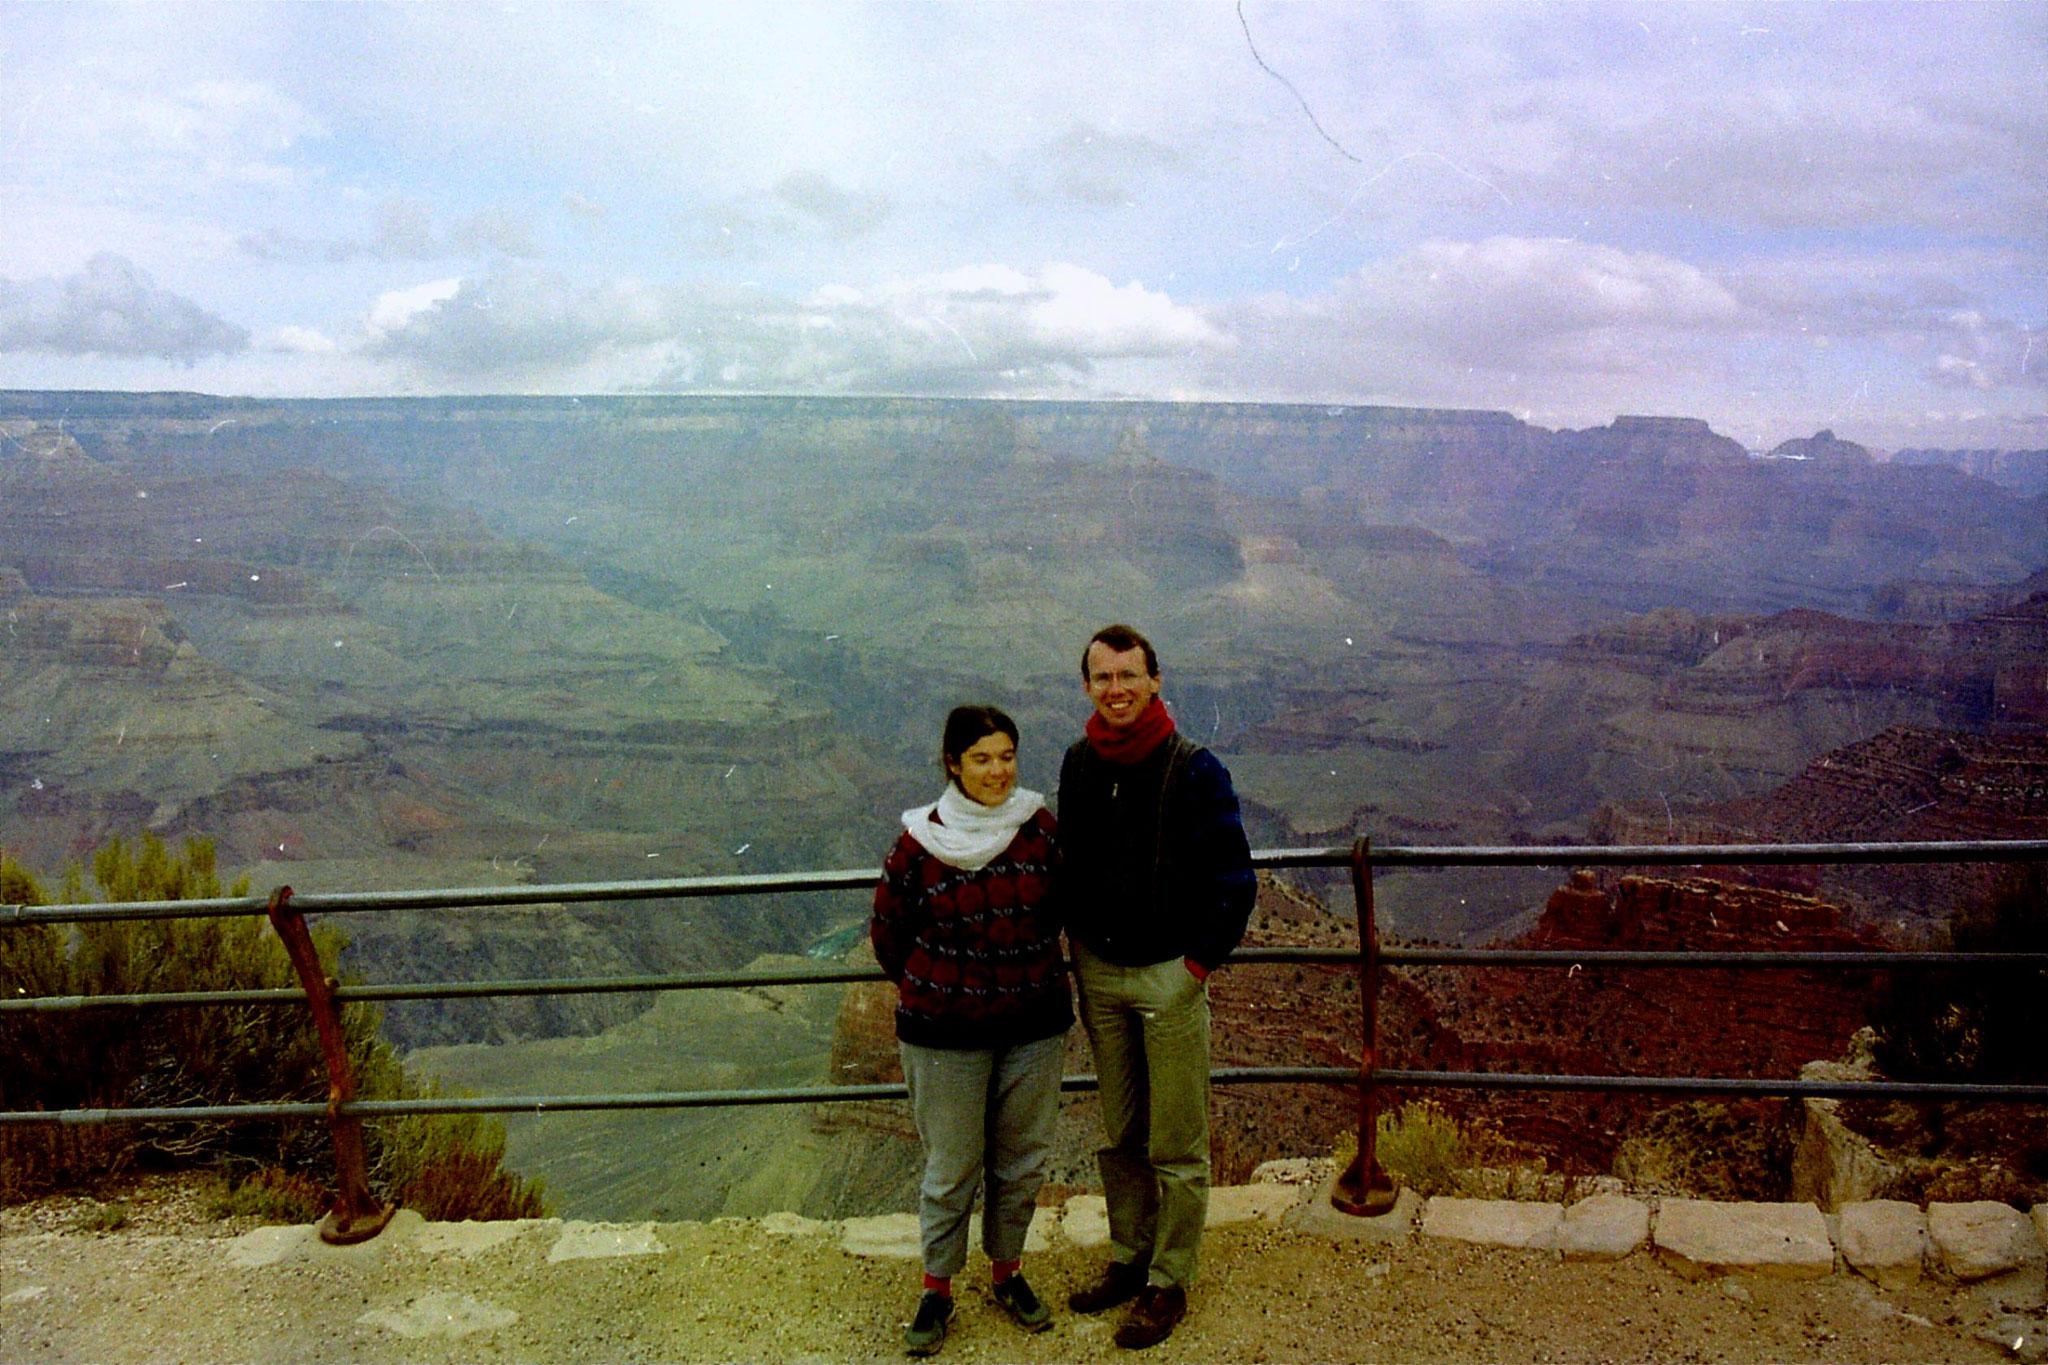 16/12/1990: Grand Canyon